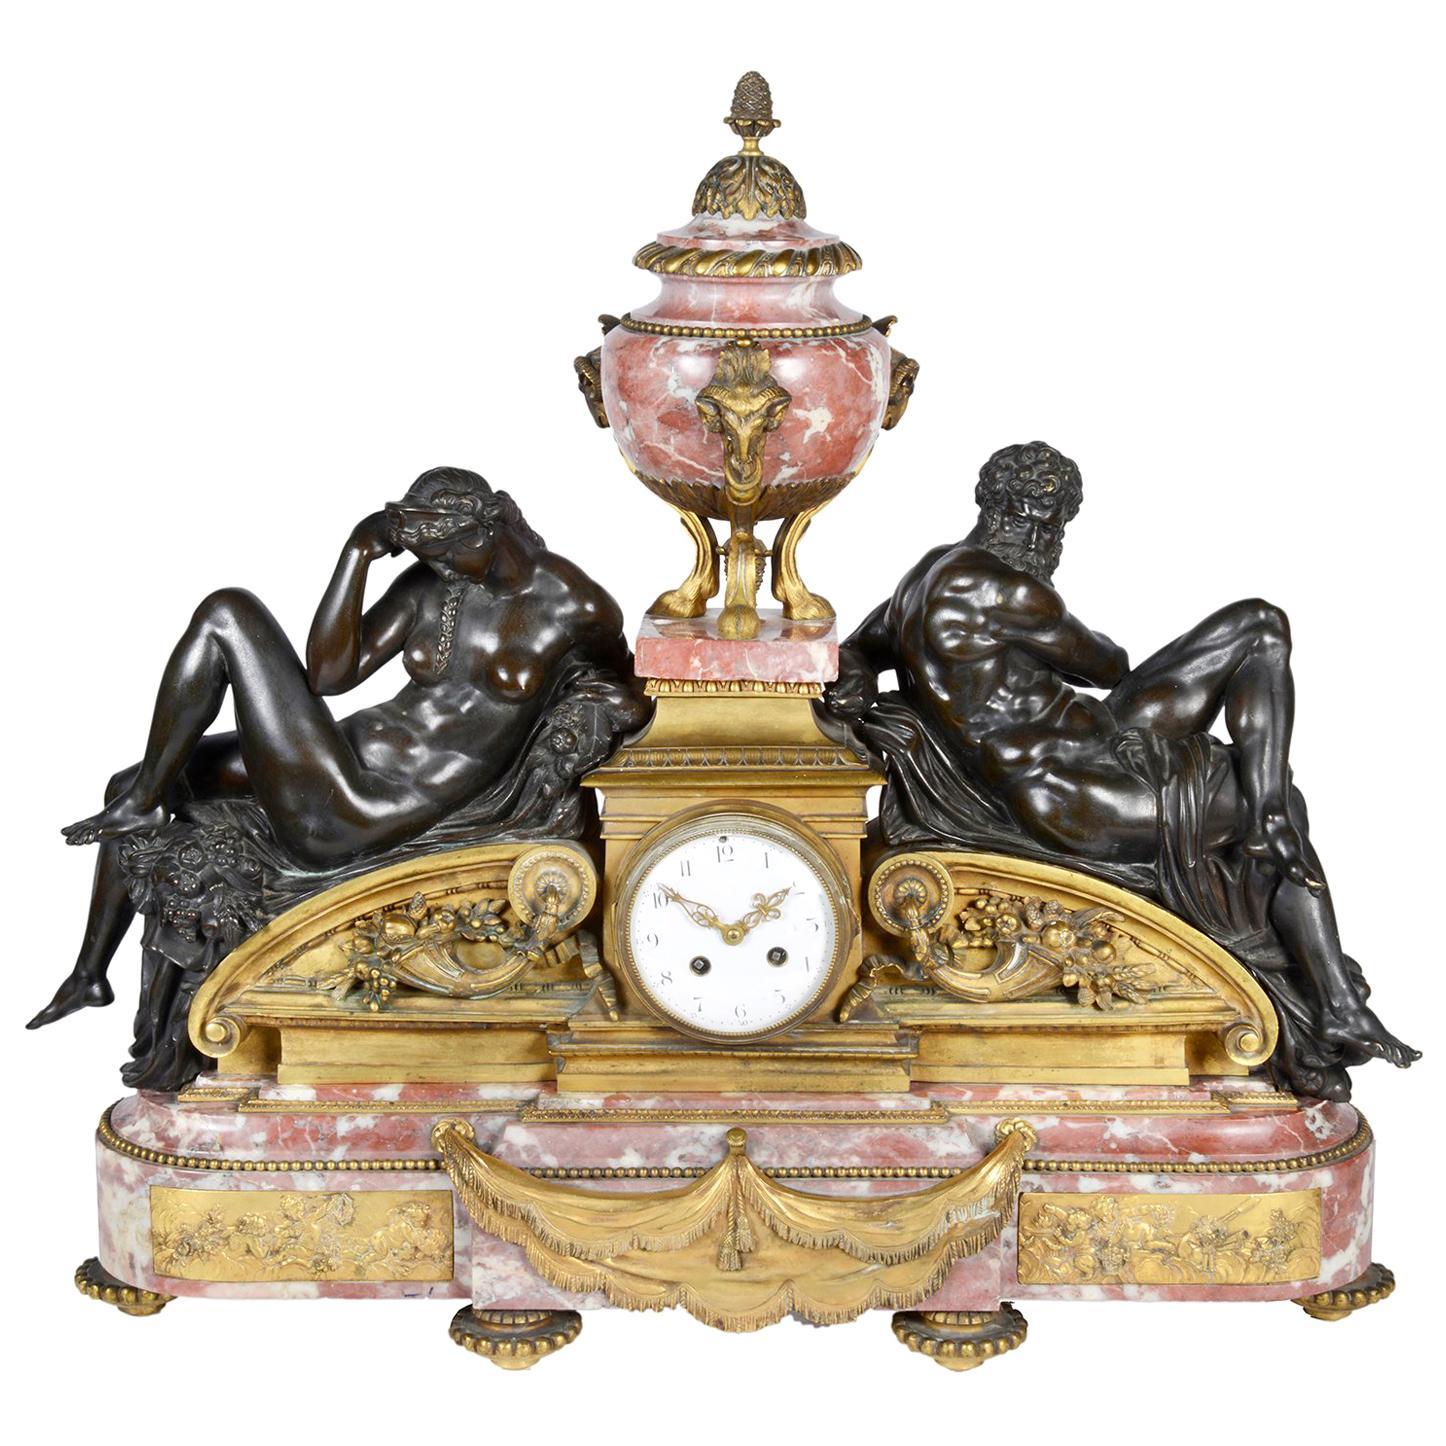 19th Century Louis XVI Style Classical Mantel Clock